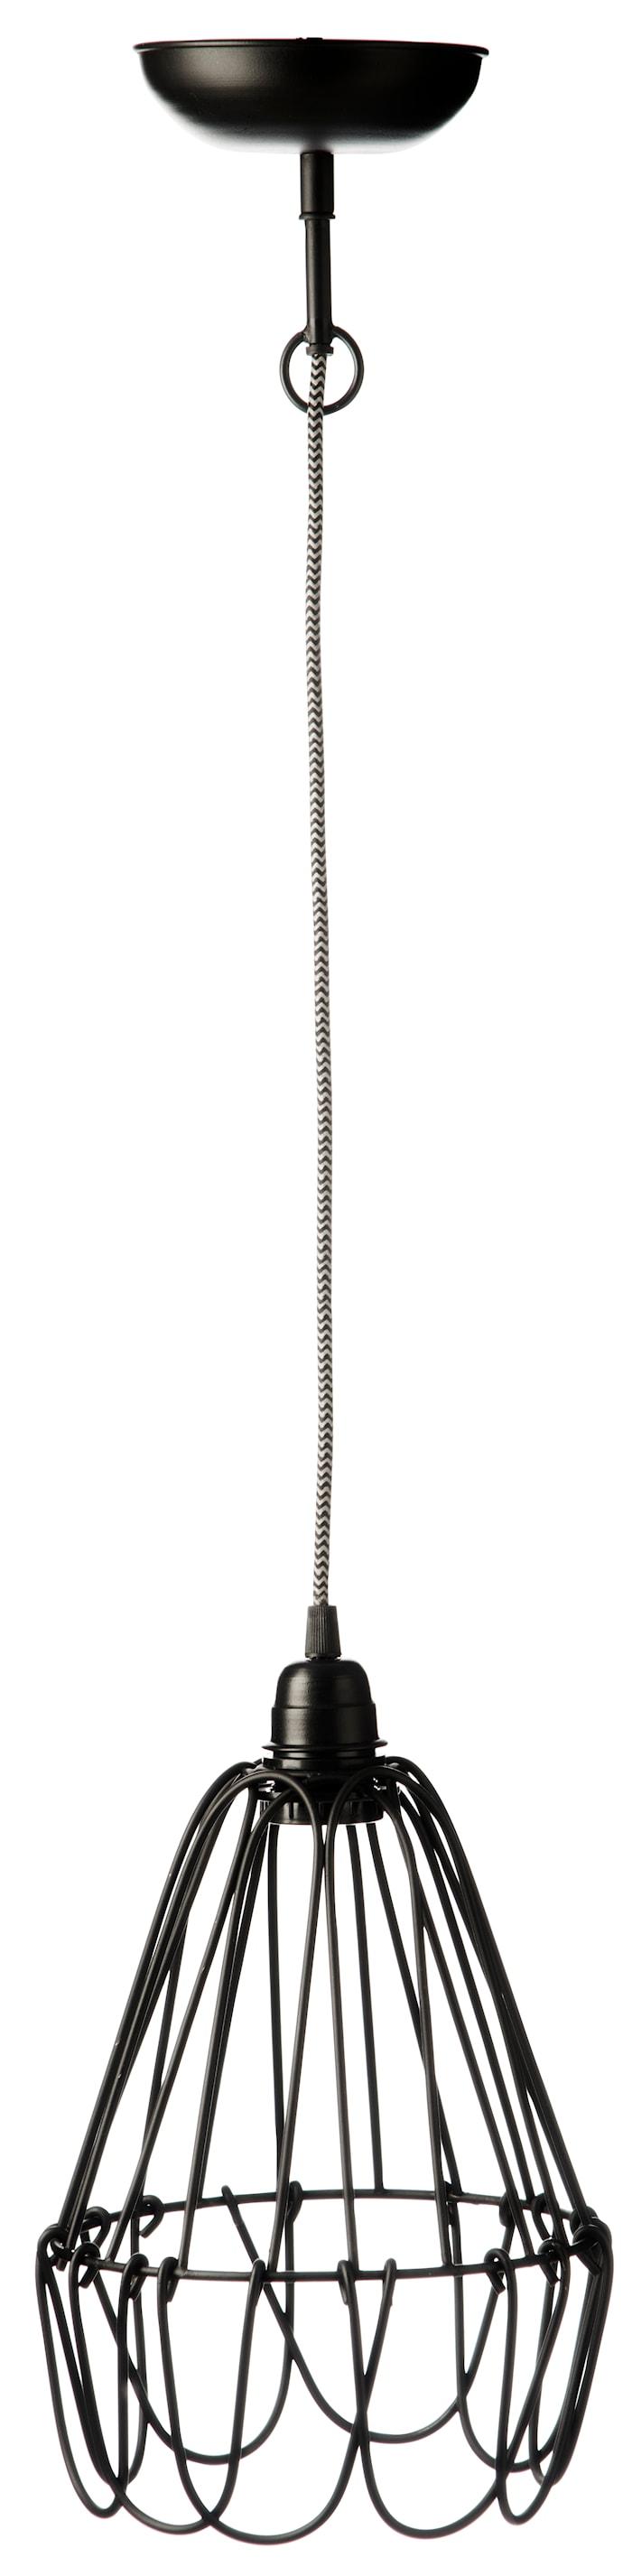 Taklampa Ø 21cm Svart